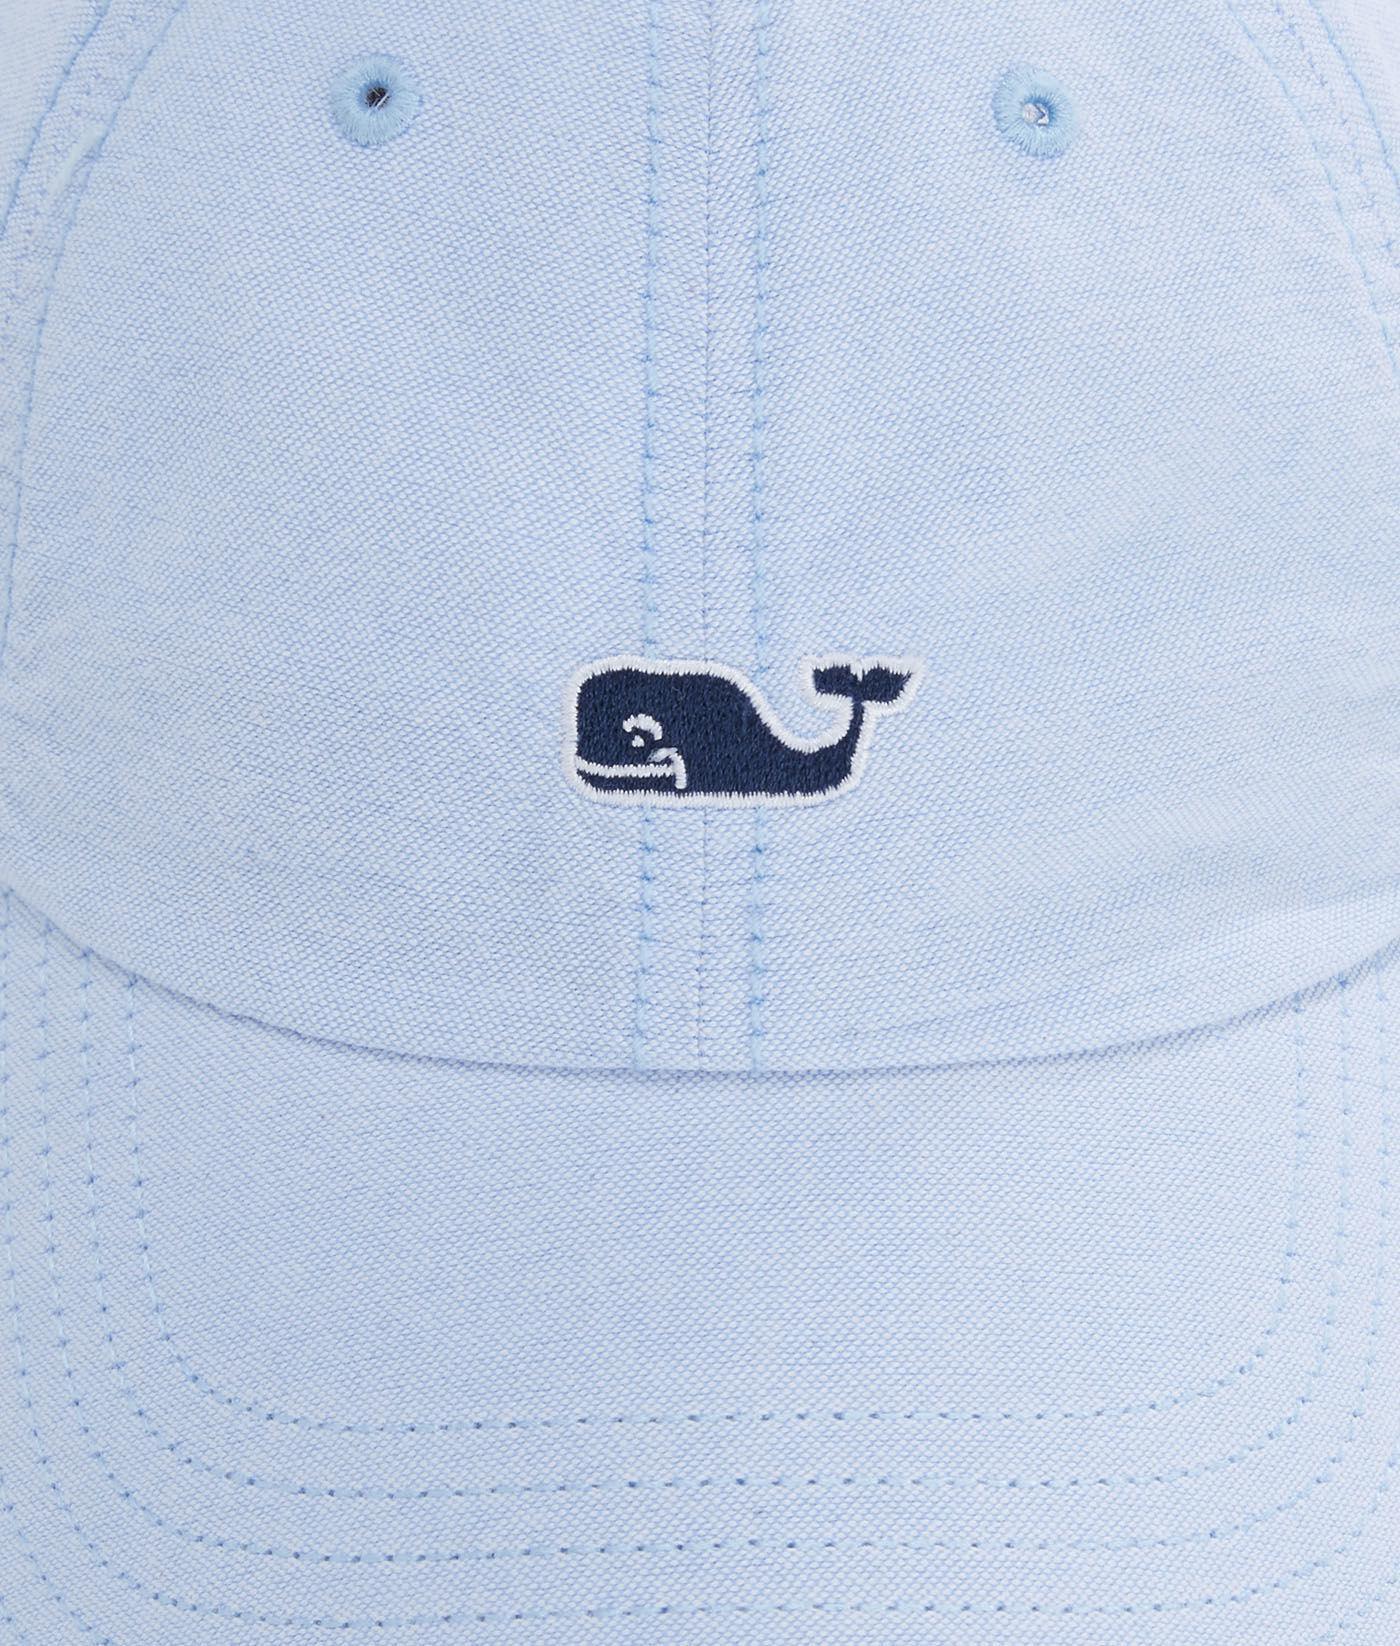 98d5ec15856 Lyst - Vineyard Vines Oxford Whale Logo Leather Strap Baseball Hat ...